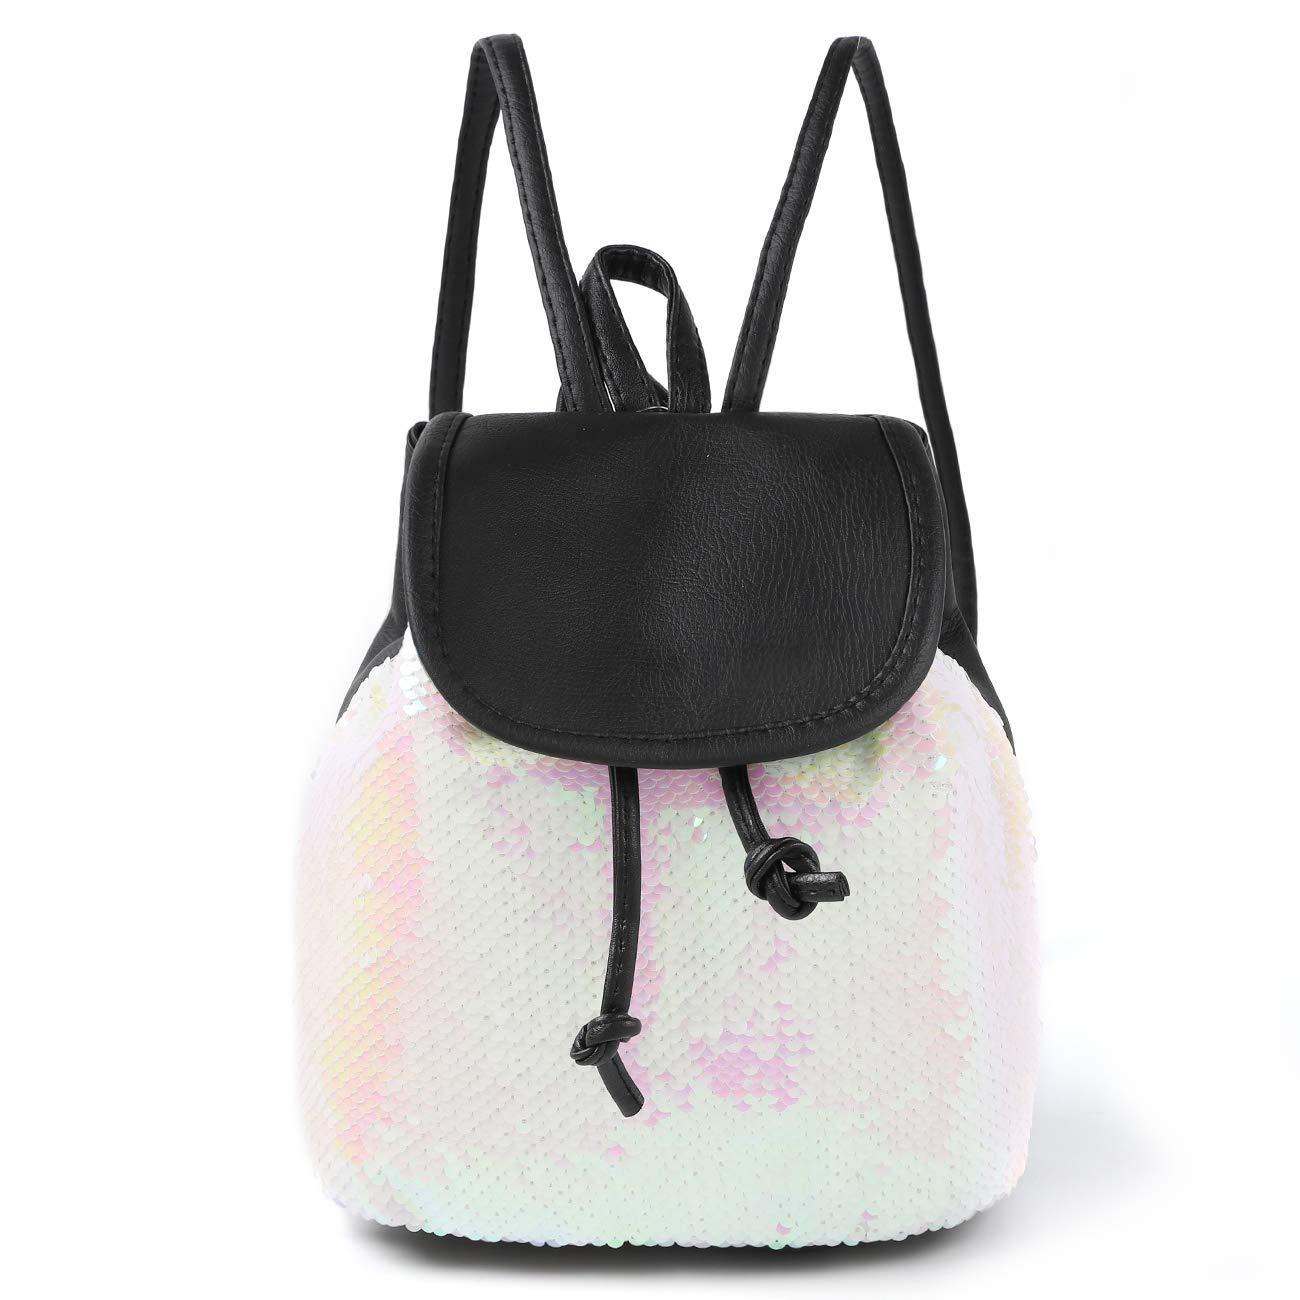 Small backpack purse bling sequins backpack school bags for teens gift  white kids backpacks jpg 1300x1300 0550e0668ab5e